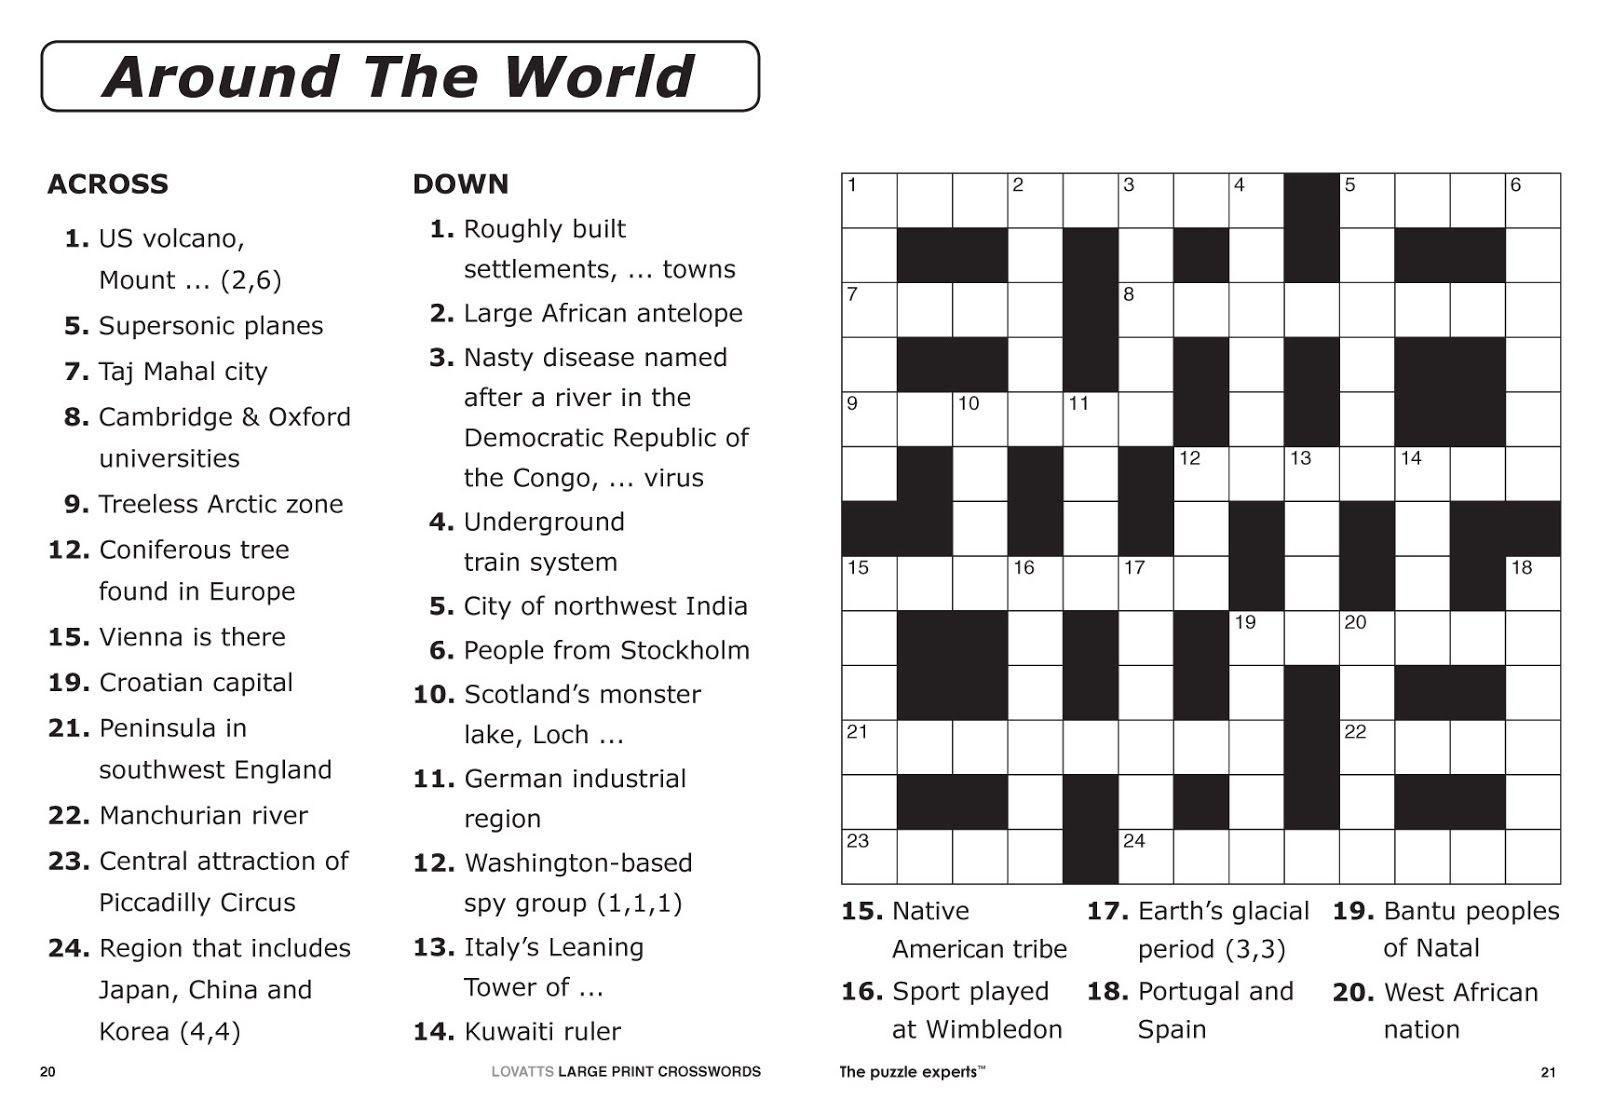 Free Printable Large Print Crossword Puzzles | M3U8 - Printable Crosswords For 14 Year Olds